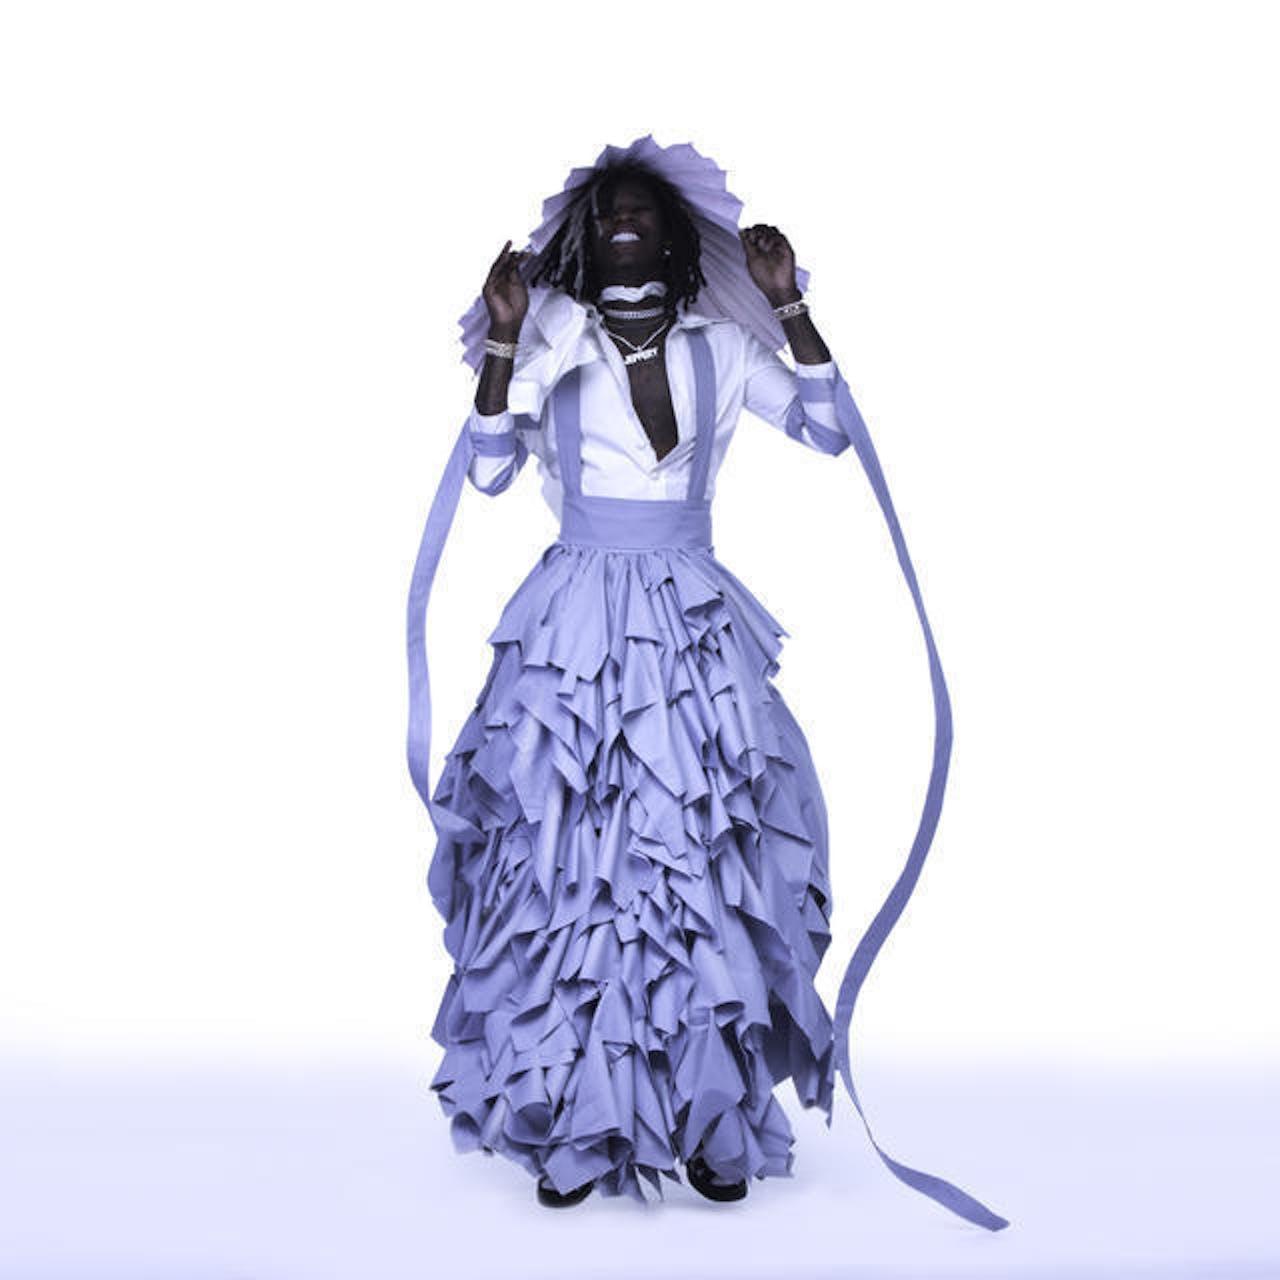 young thug jeffrey album cover dress